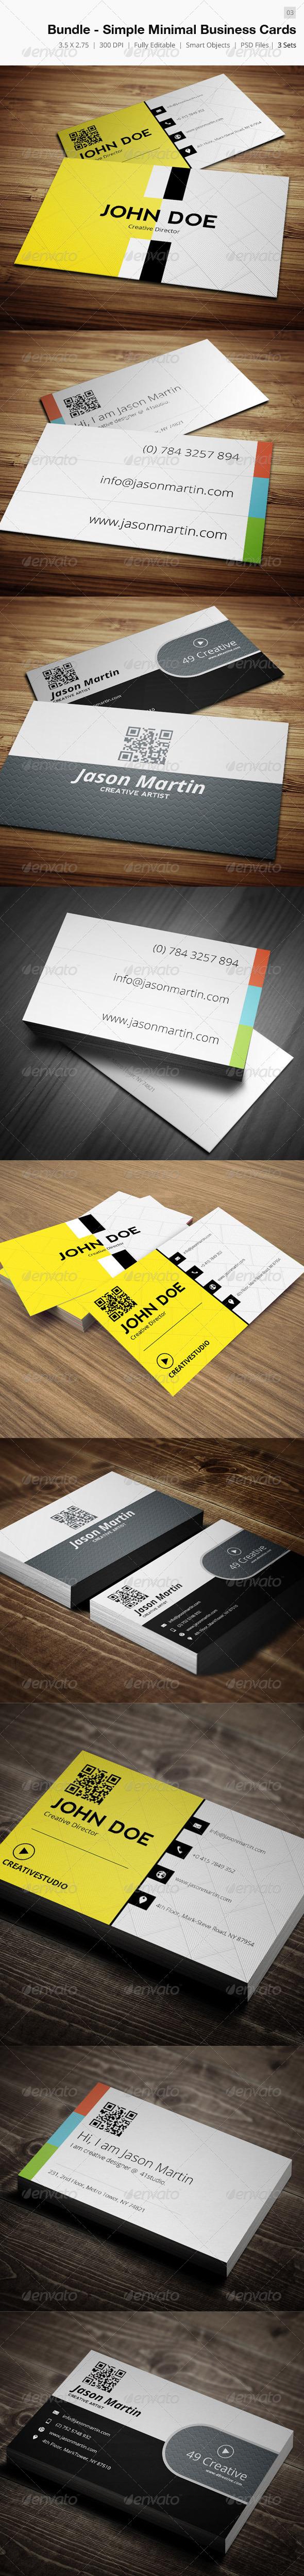 GraphicRiver Bundle Simple Minimal Business Card 03 4406398